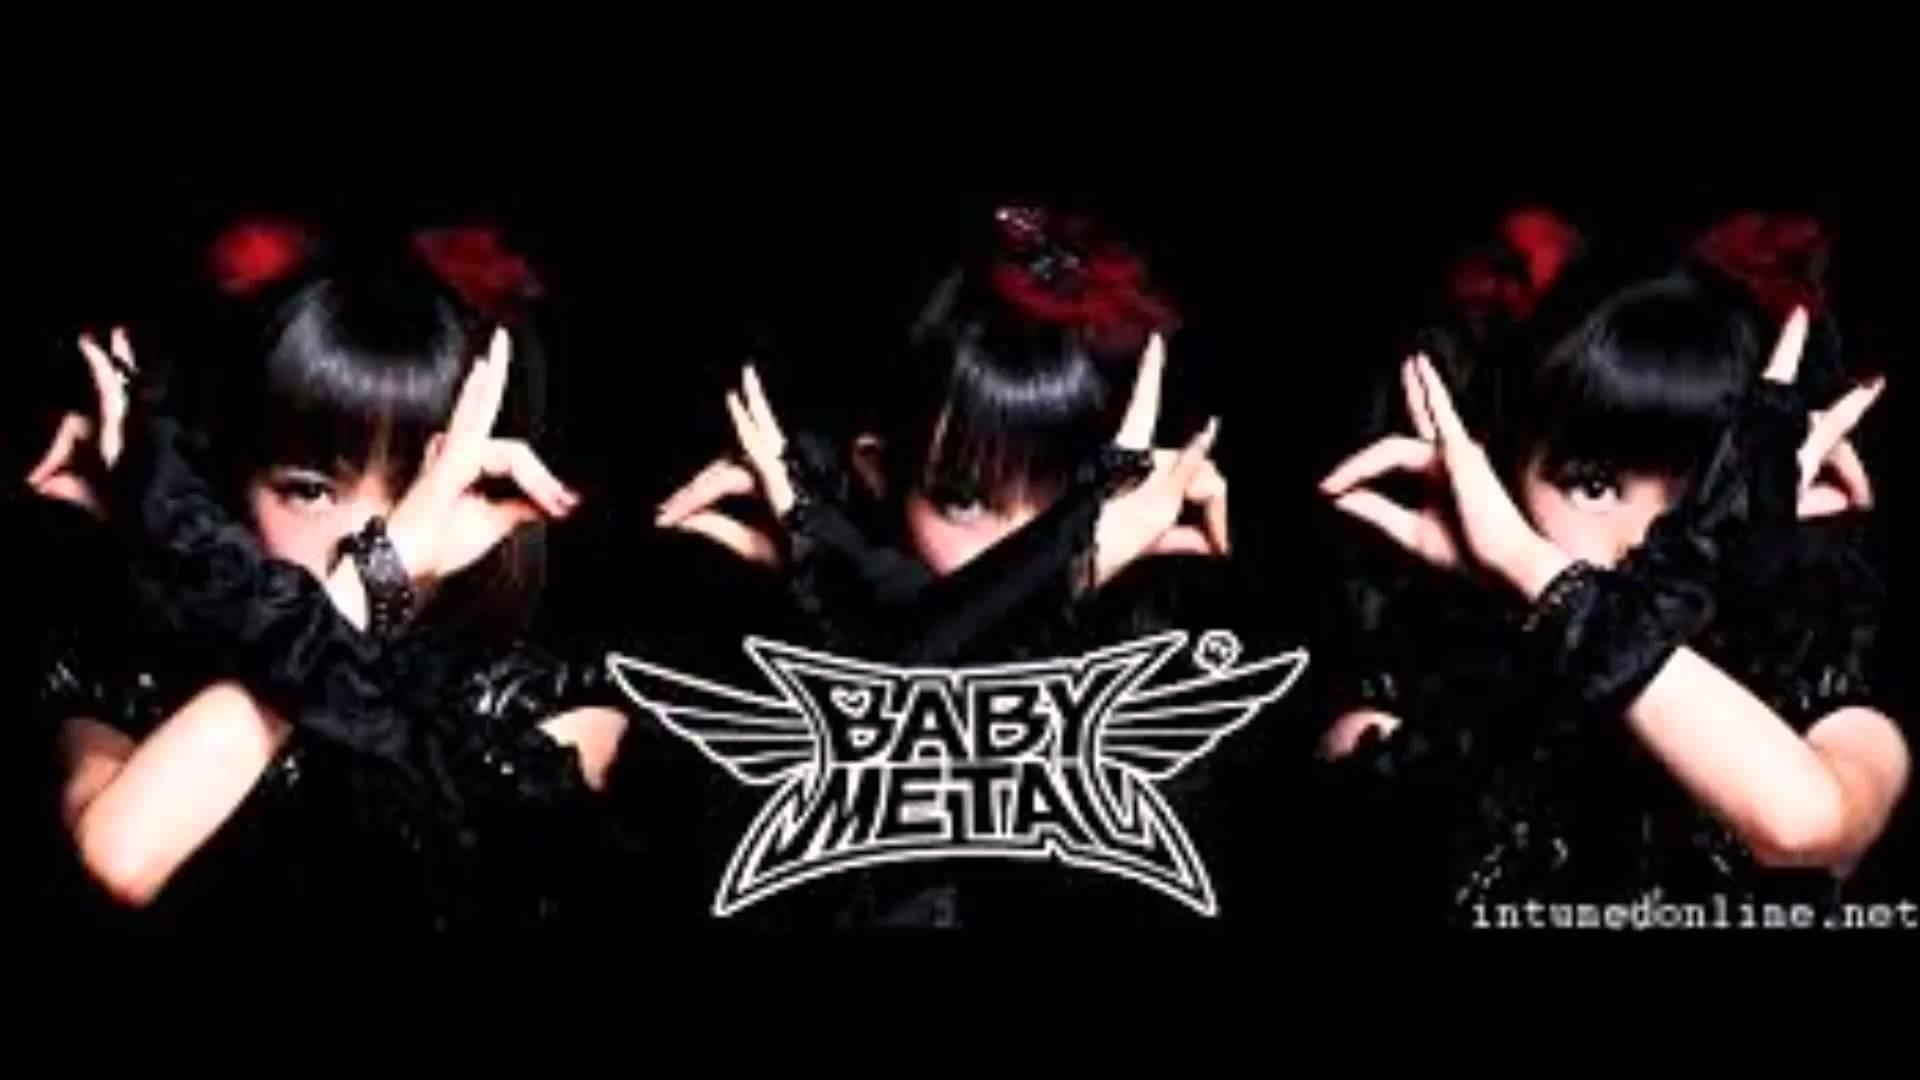 Baby Metal Wallpaper Hd 76 Images